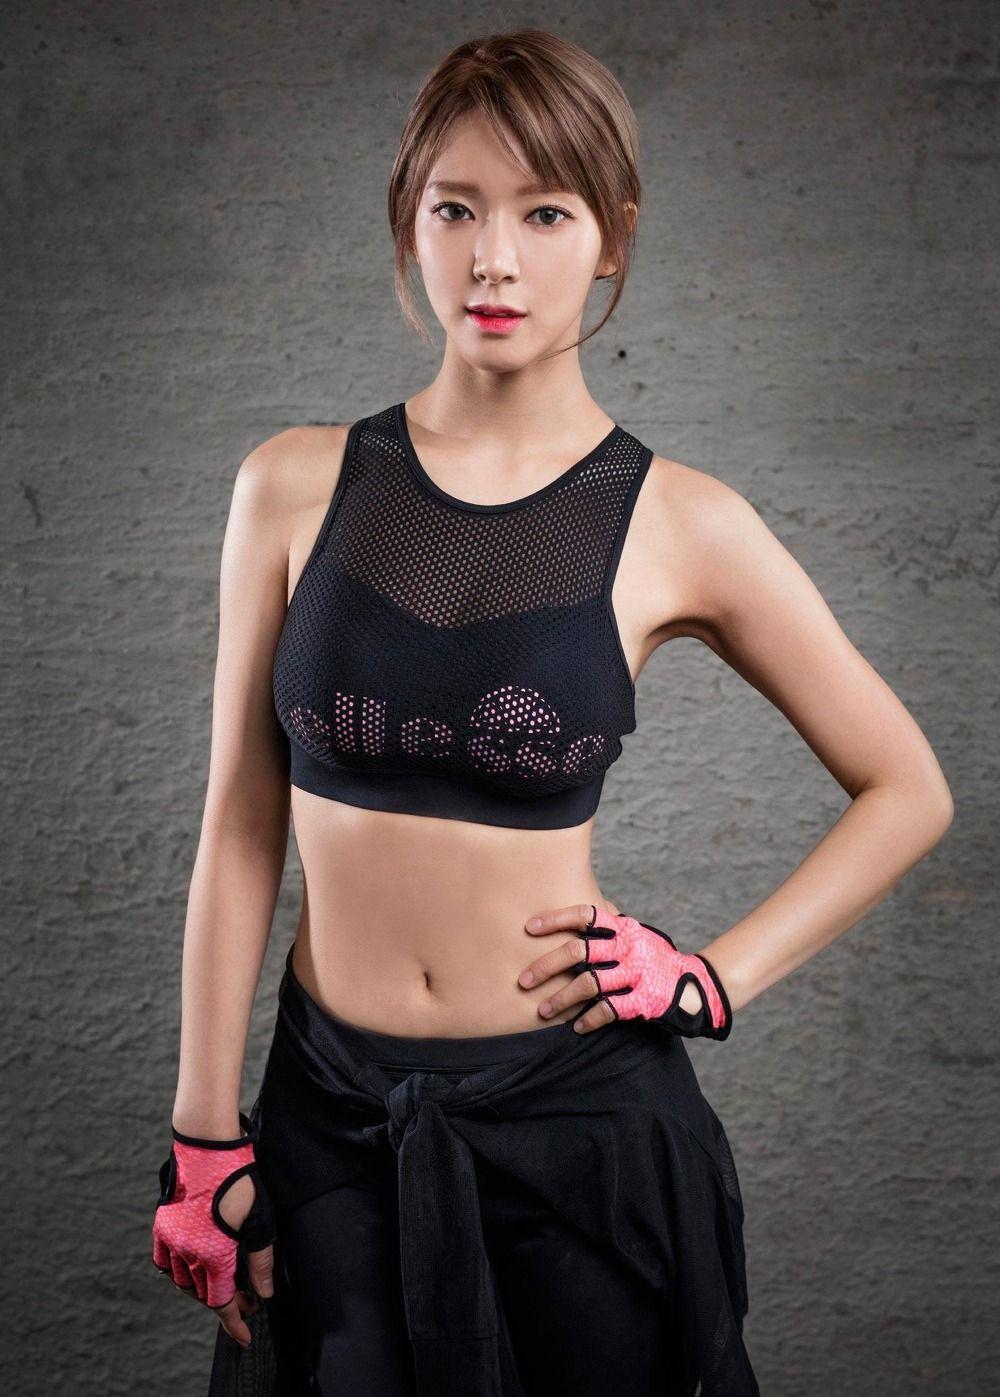 Sexy asian girls group sex with 1fuckdatecom 10